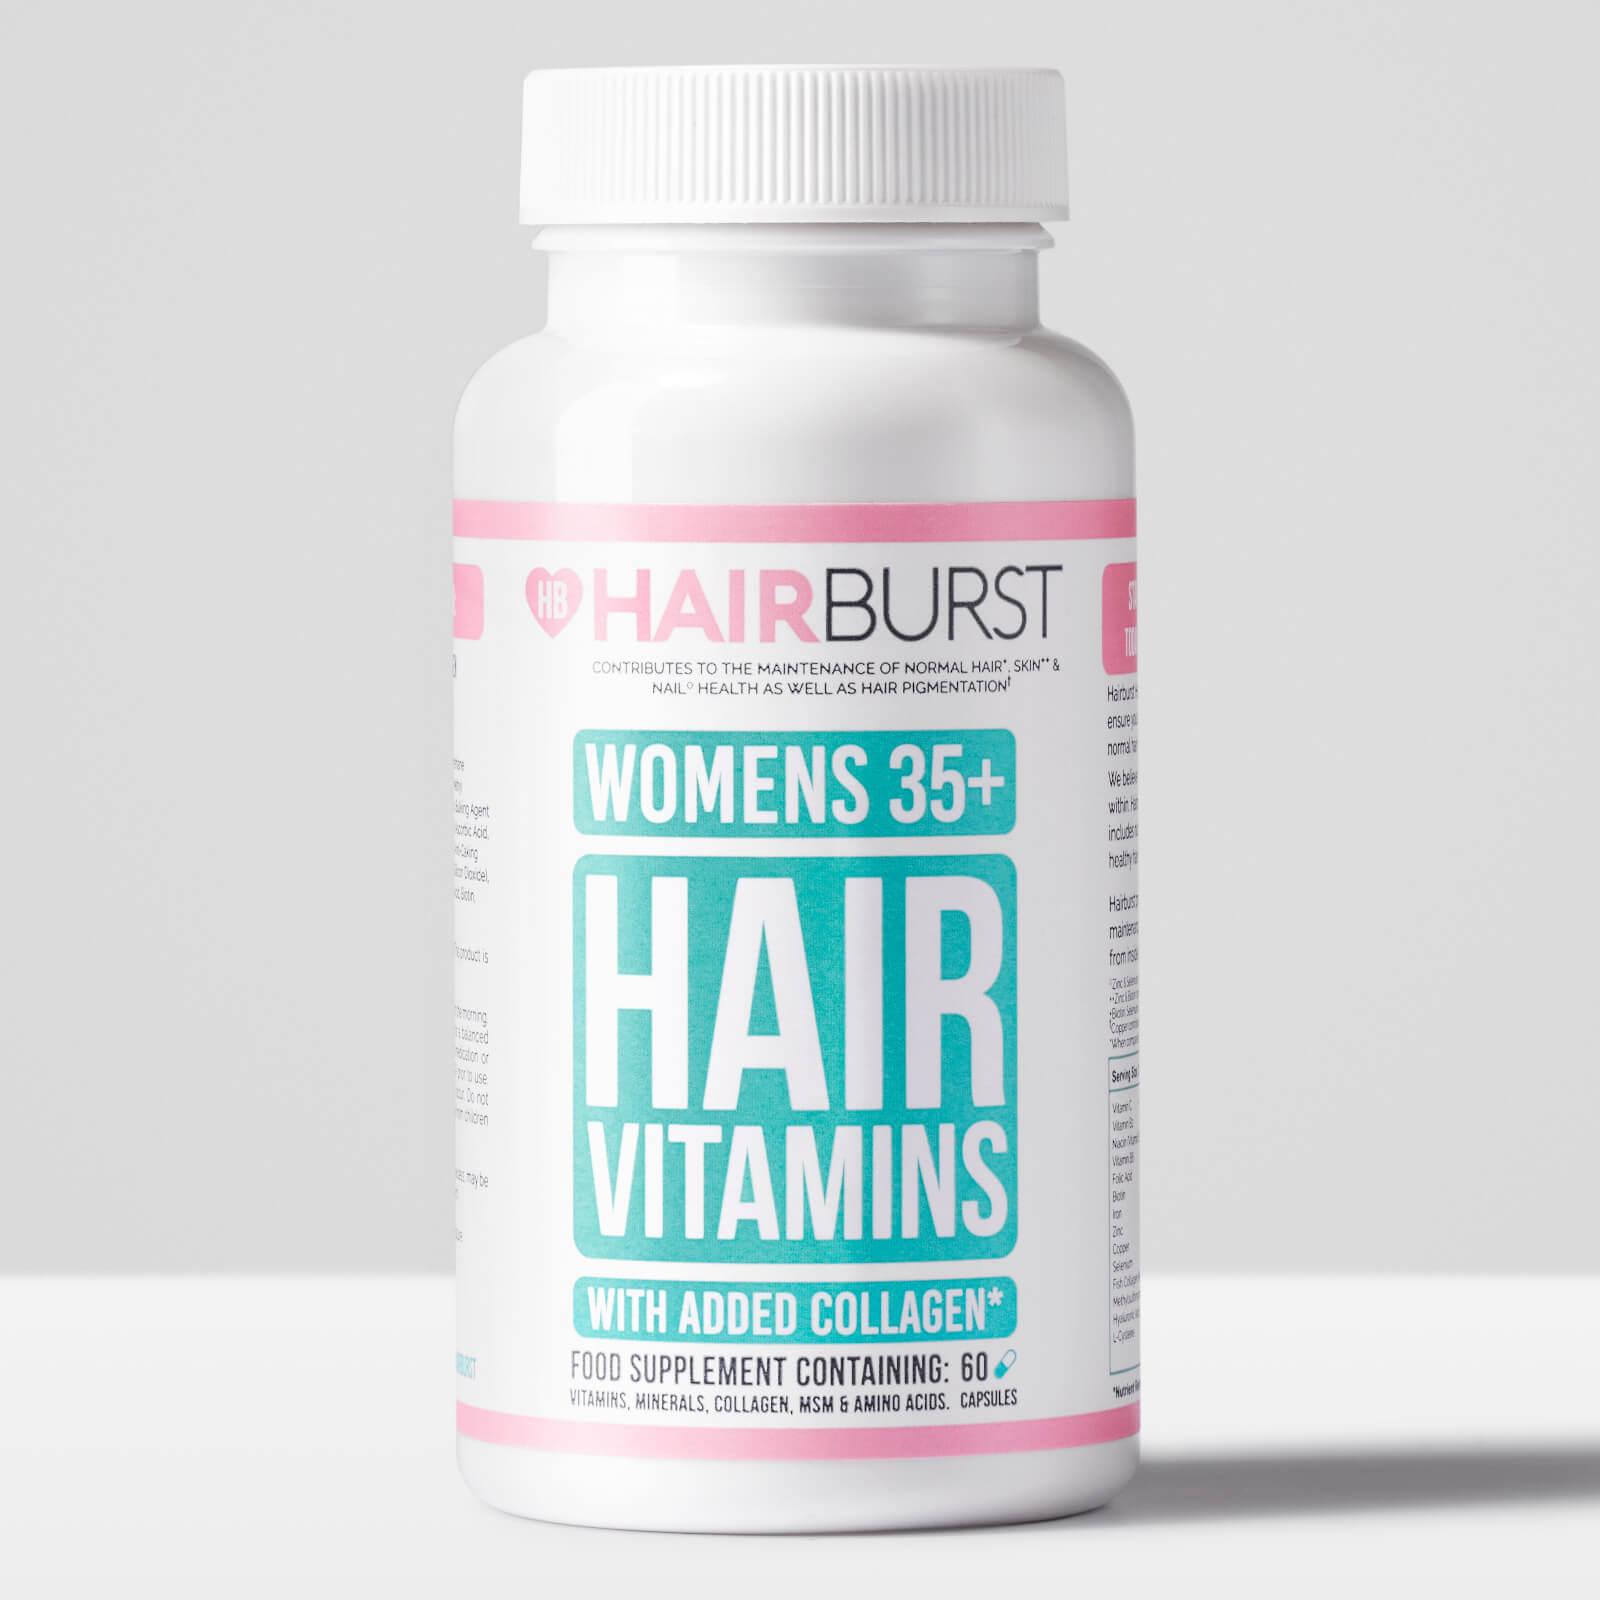 Купить Hairburst Women's 35+ Vitamins (60 Capsules) 72g